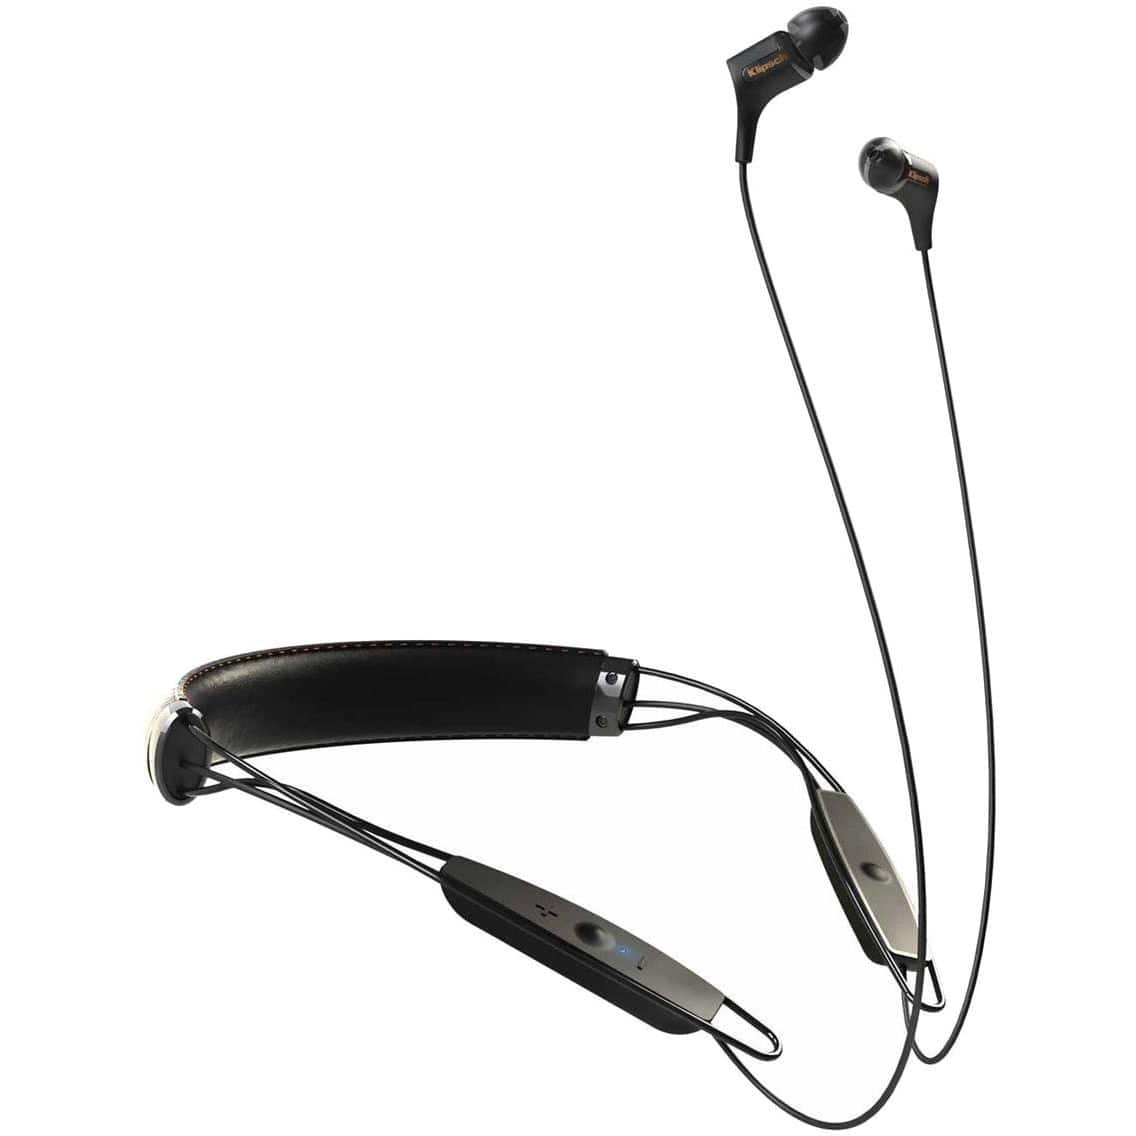 New Klipsch R6 Neckband Wireless Bluetooth In-ear Headphones Black for $49.99 + FS buydig via eBay